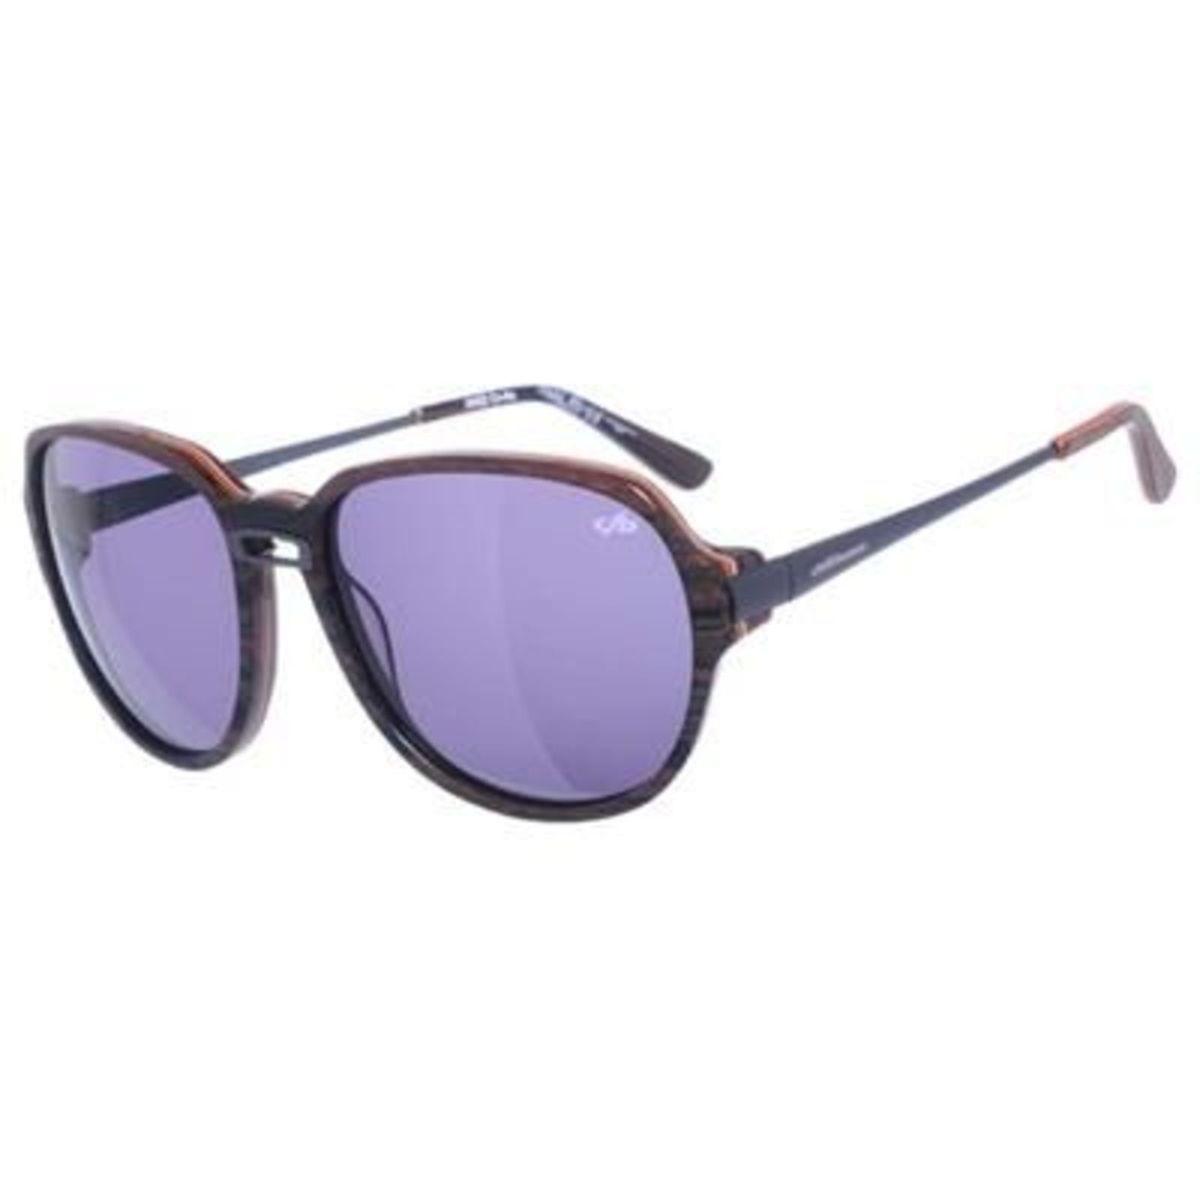 8eafe8db538f6 óculos de sol chilli beans - óculos chilli beans.  Czm6ly9wag90b3muzw5qb2vplmnvbs5ici9wcm9kdwn0cy8zotkxmjkvmgjkmde5mjgynzq3n2u0owfjmzhhote4zde2yze0njiuanbn  ...